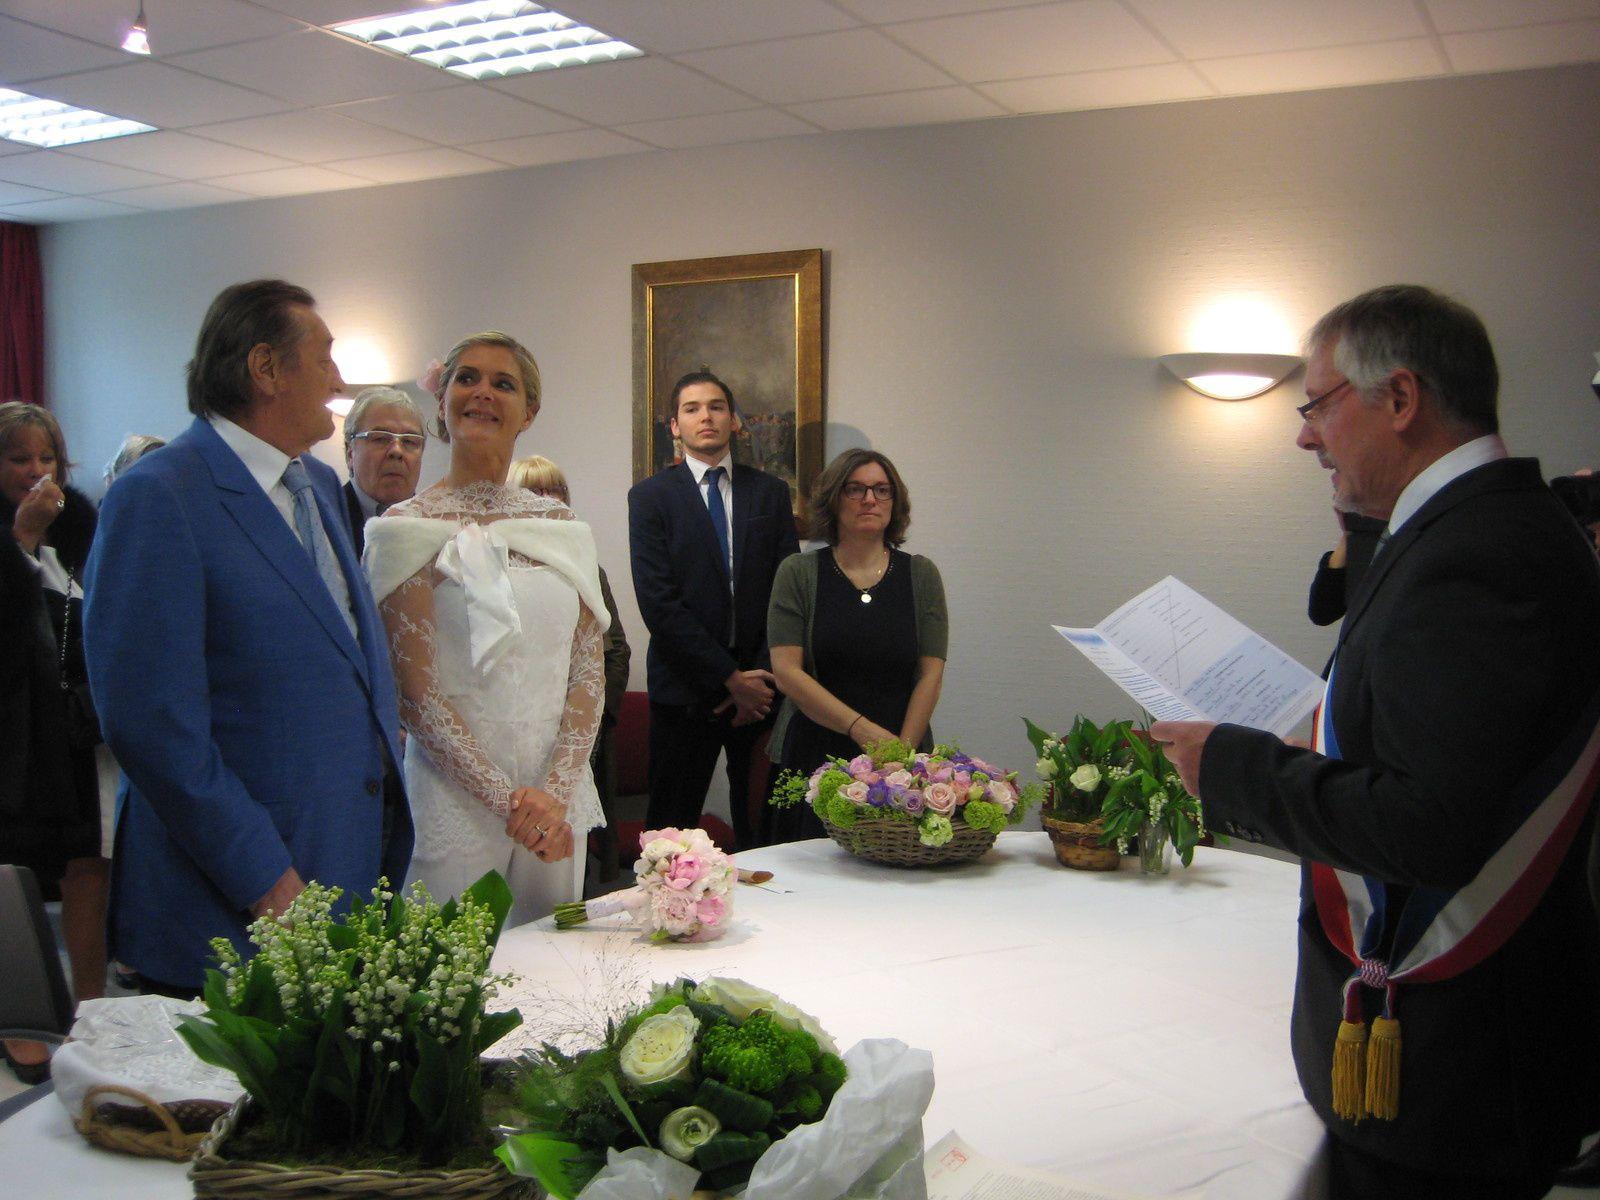 Mariage à Norolles (photos)